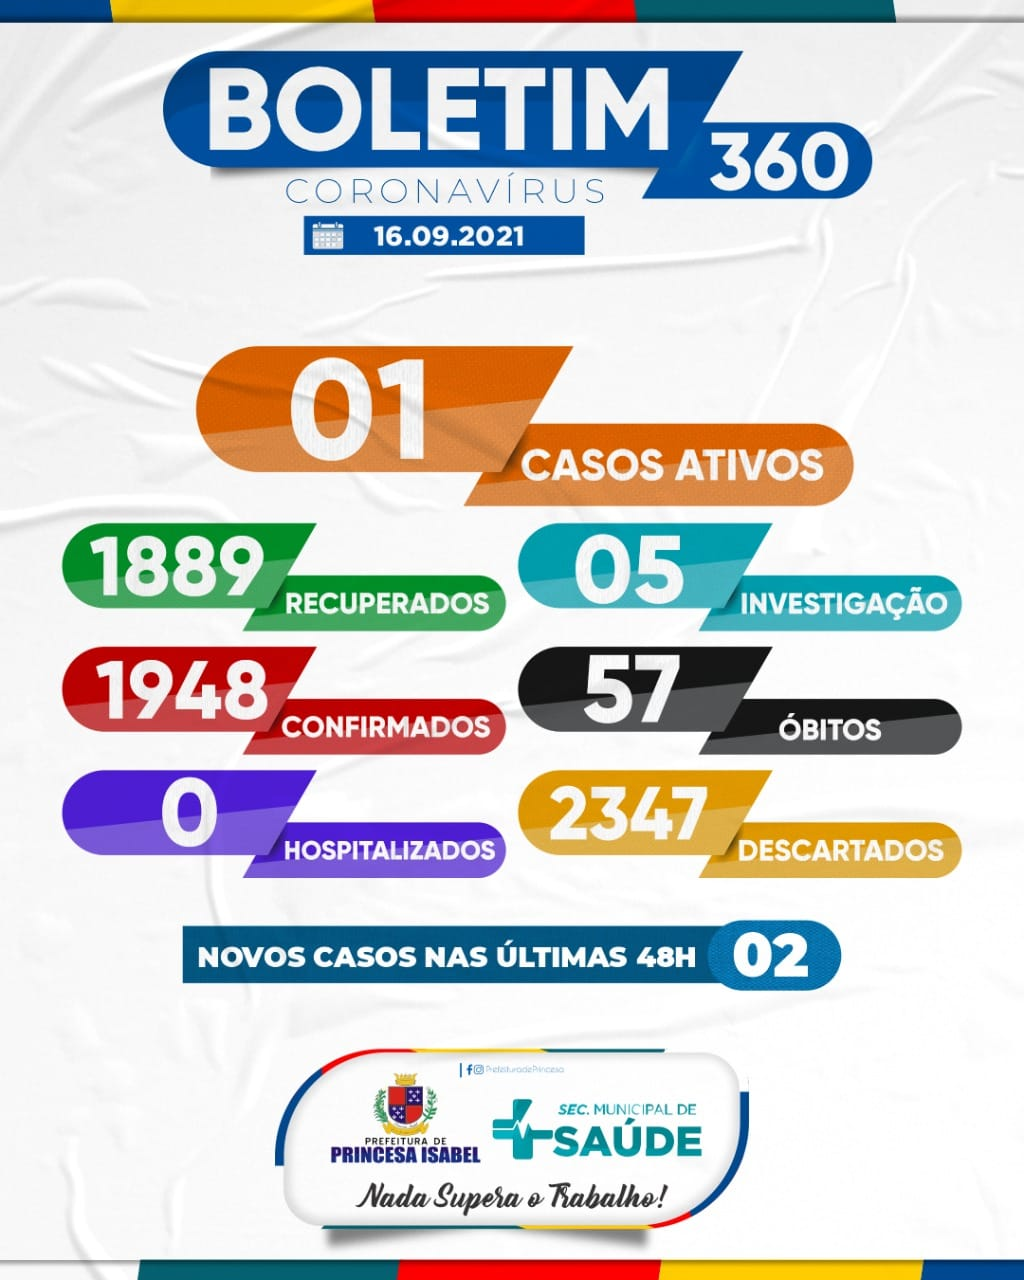 BOLETIM 360 - 16/09/2021